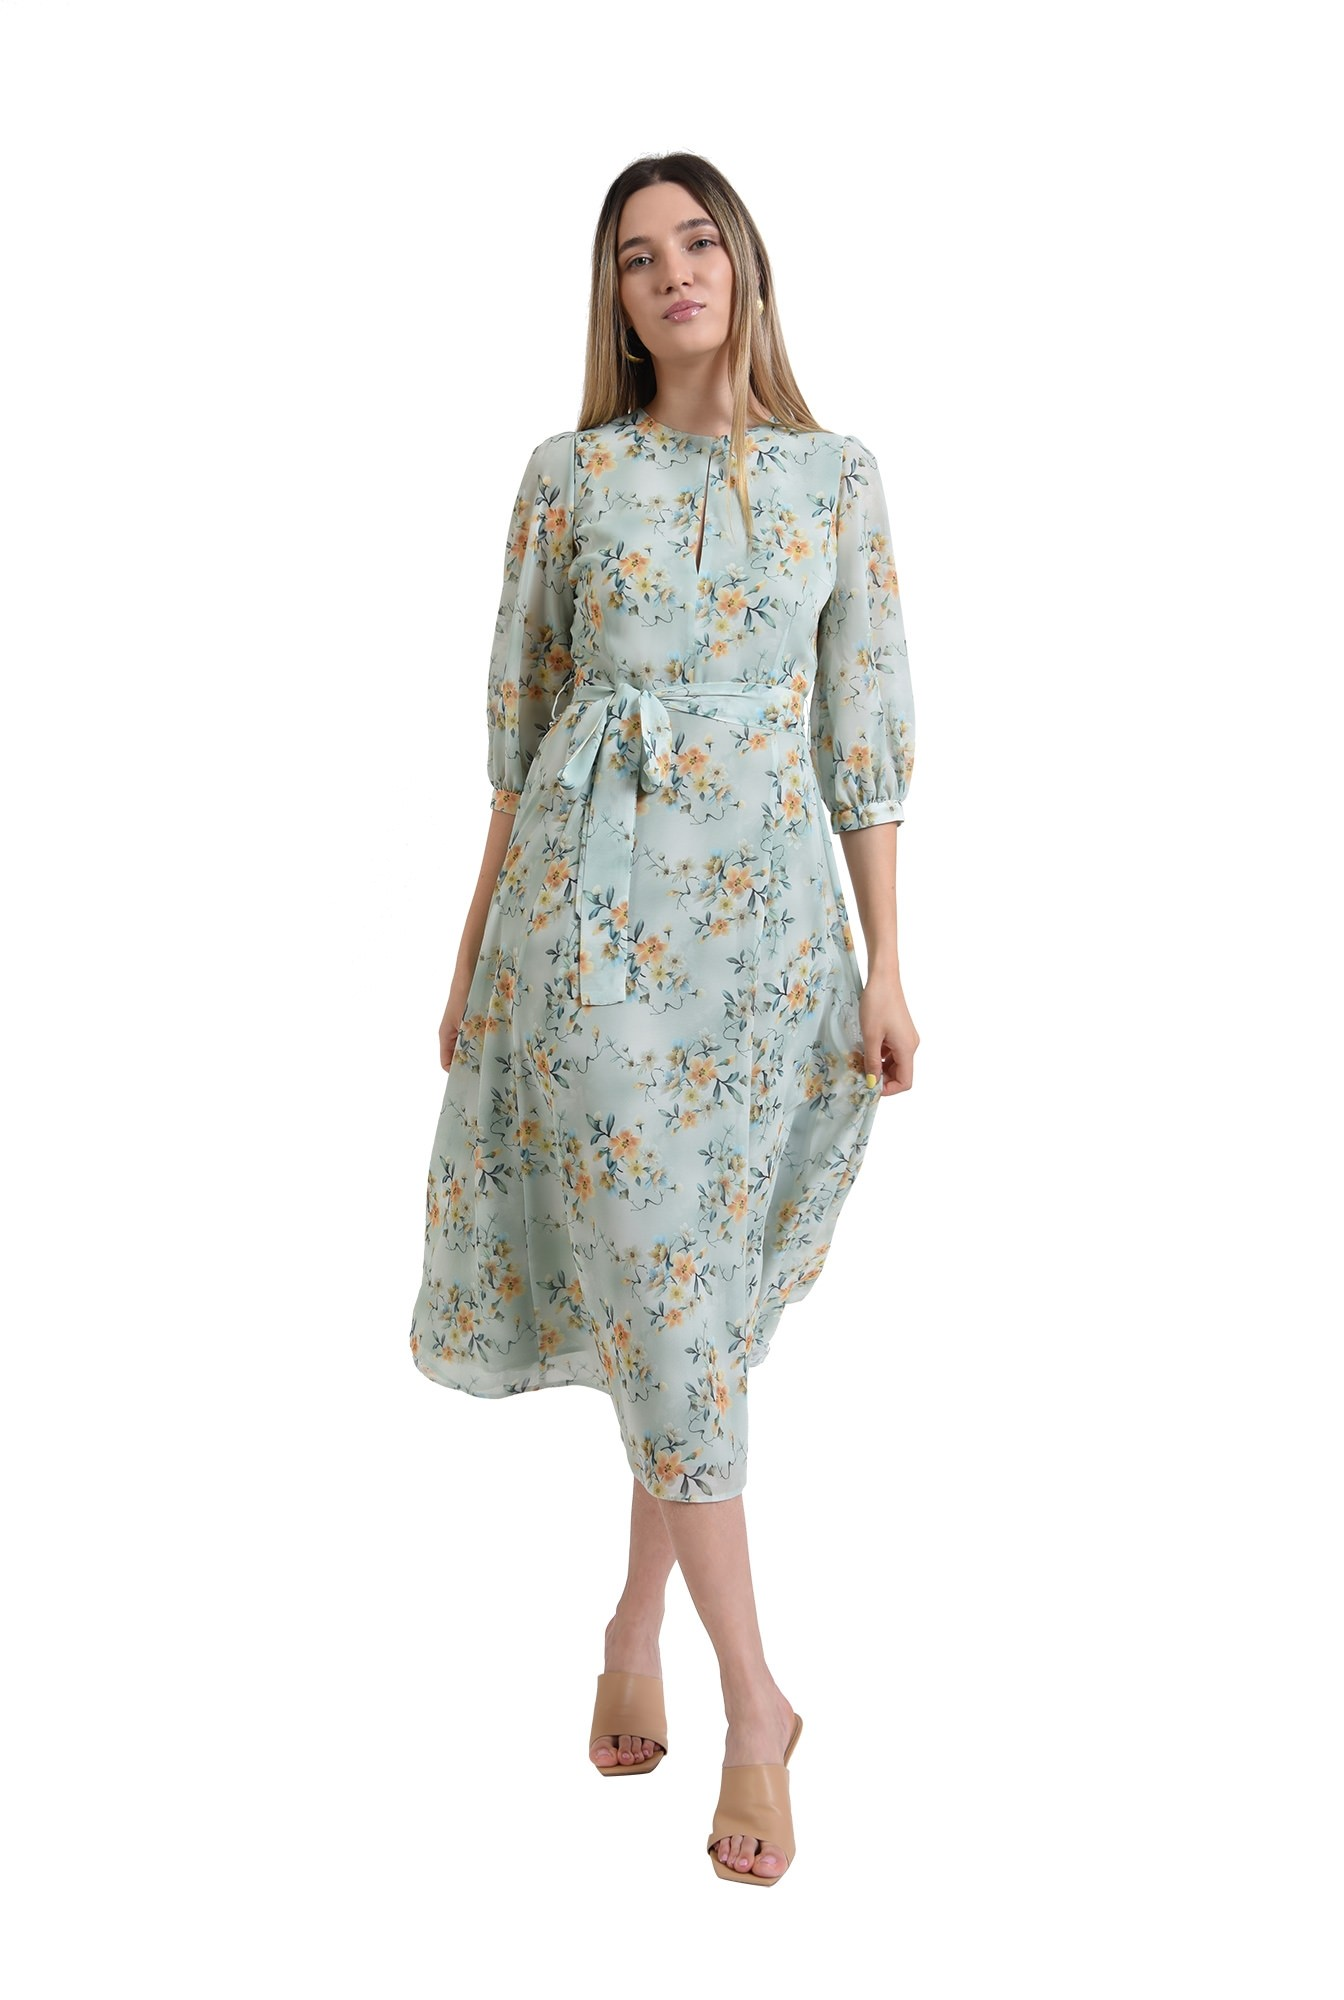 rochie eleganta, verde, pastel, cu flori, poema, evazata